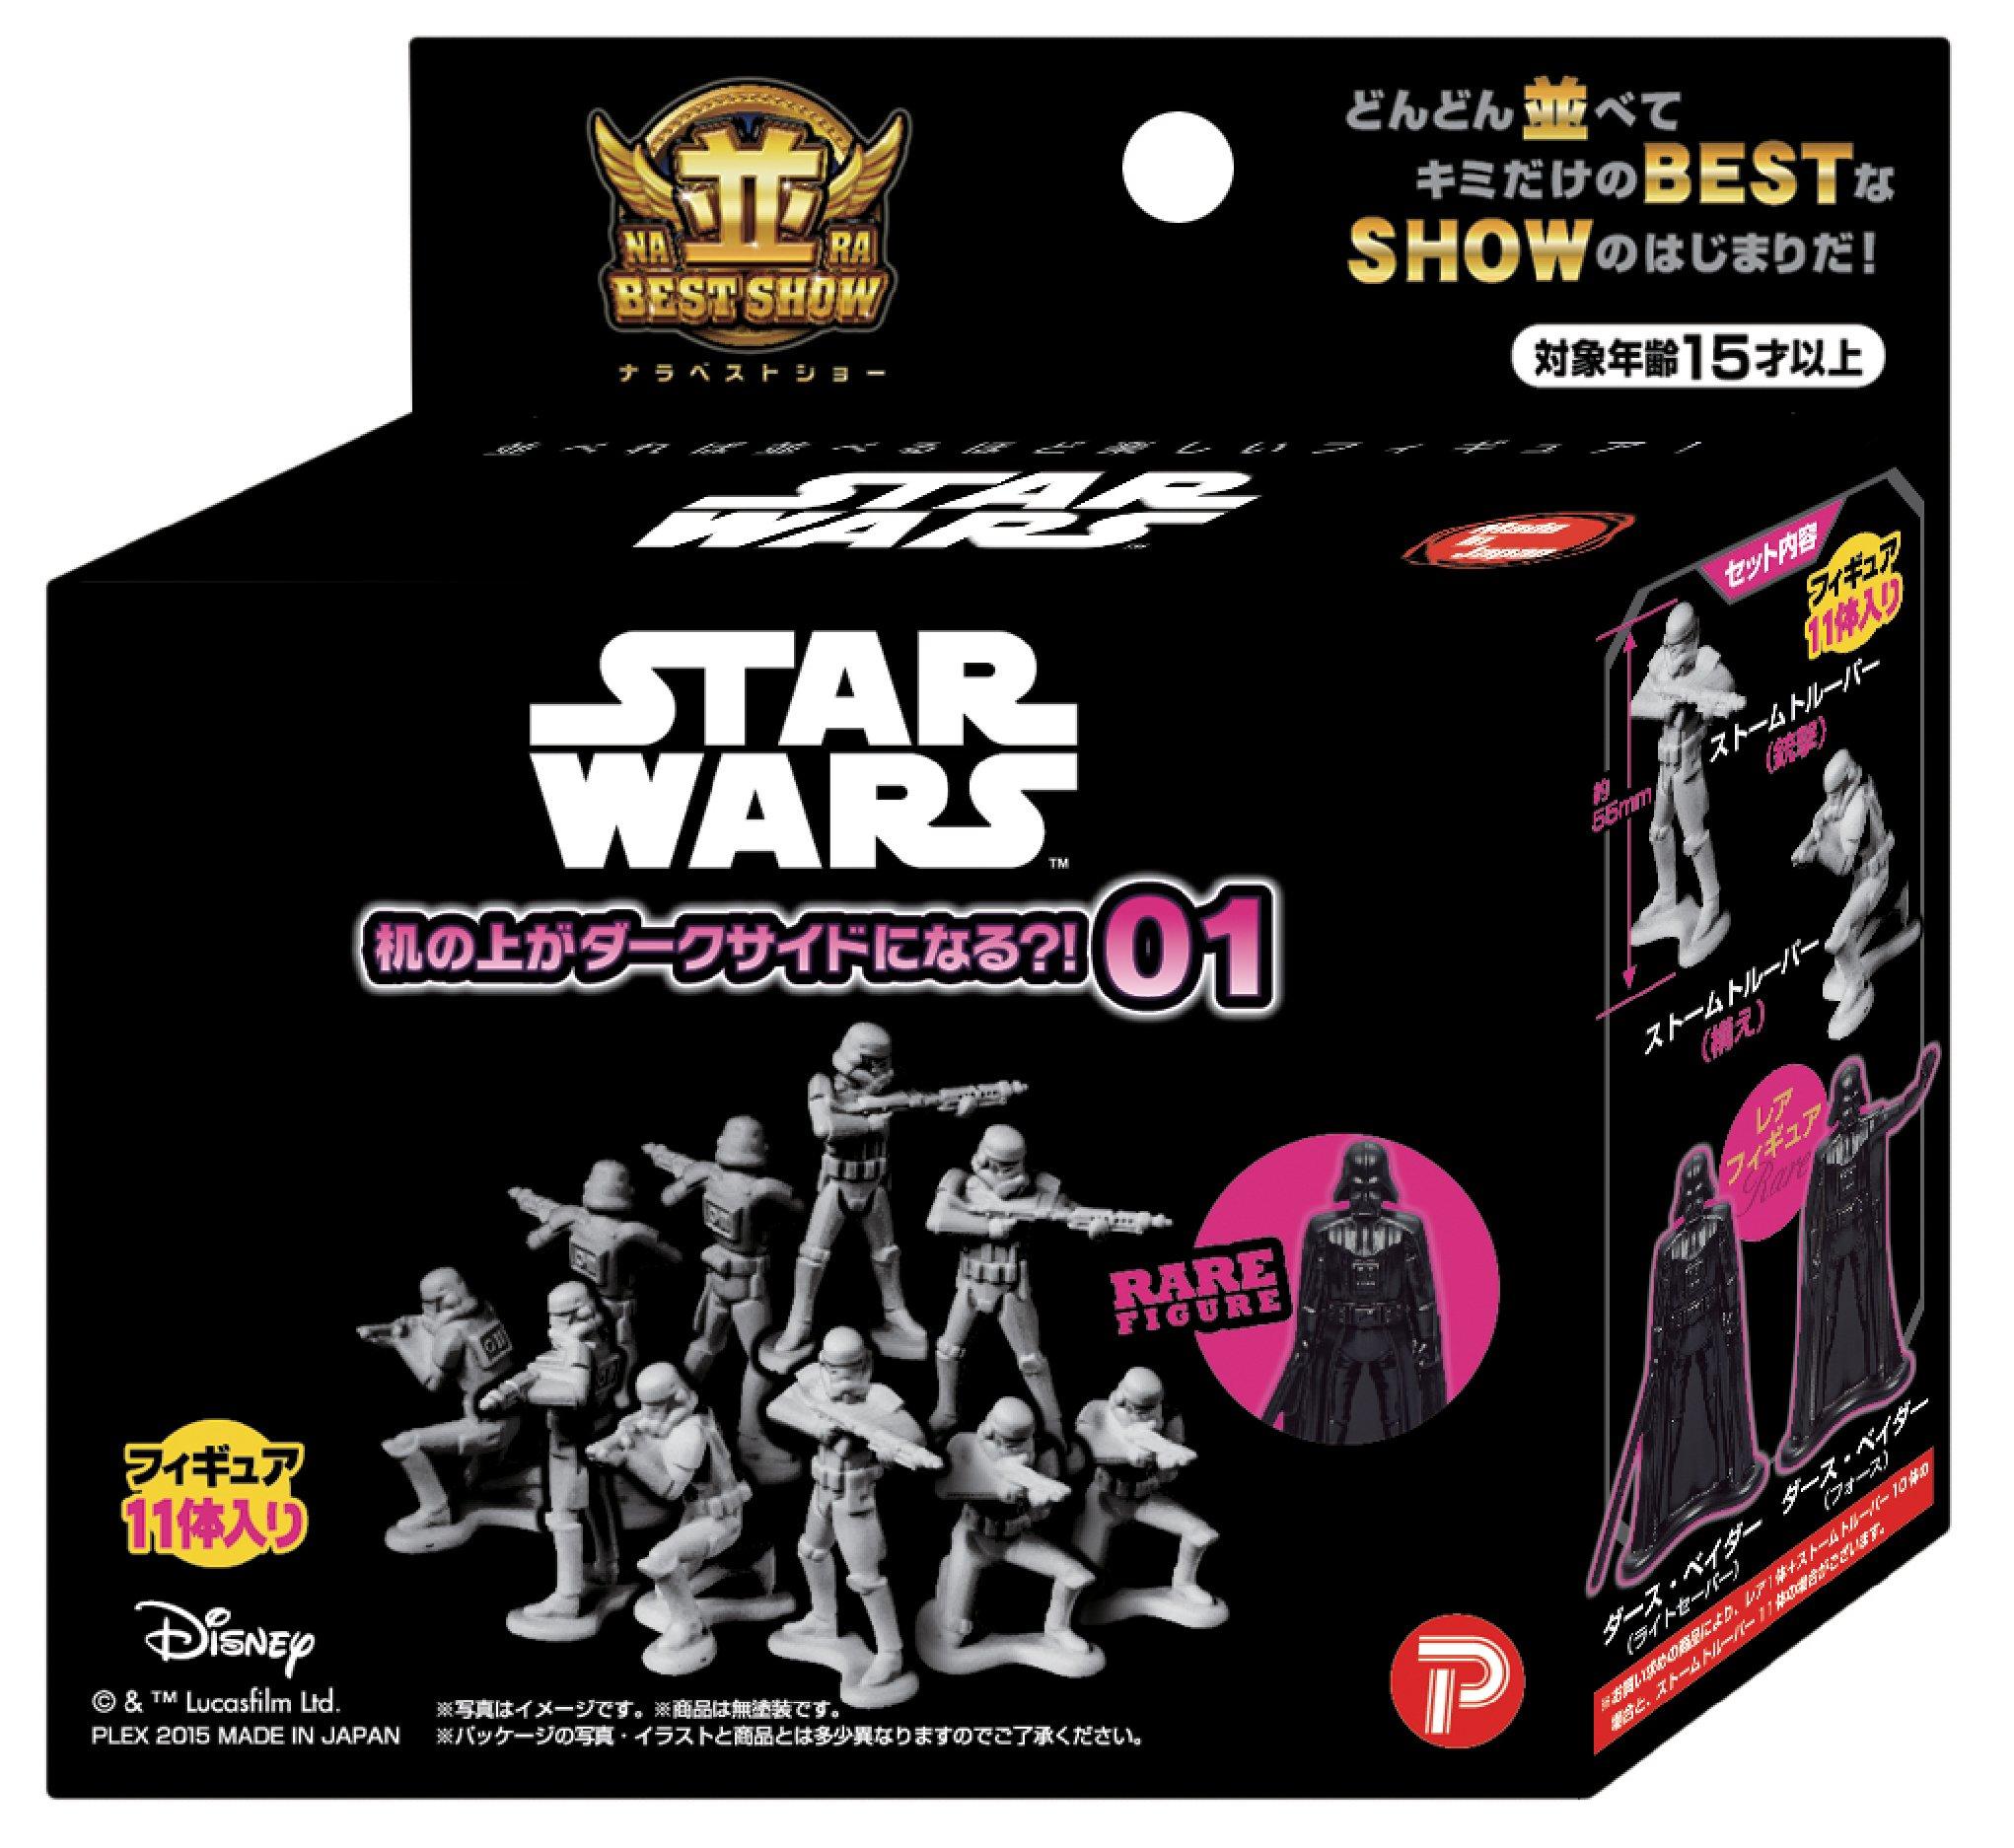 Nara-best Show Star Wars Desk Become the Dark Side!? 01